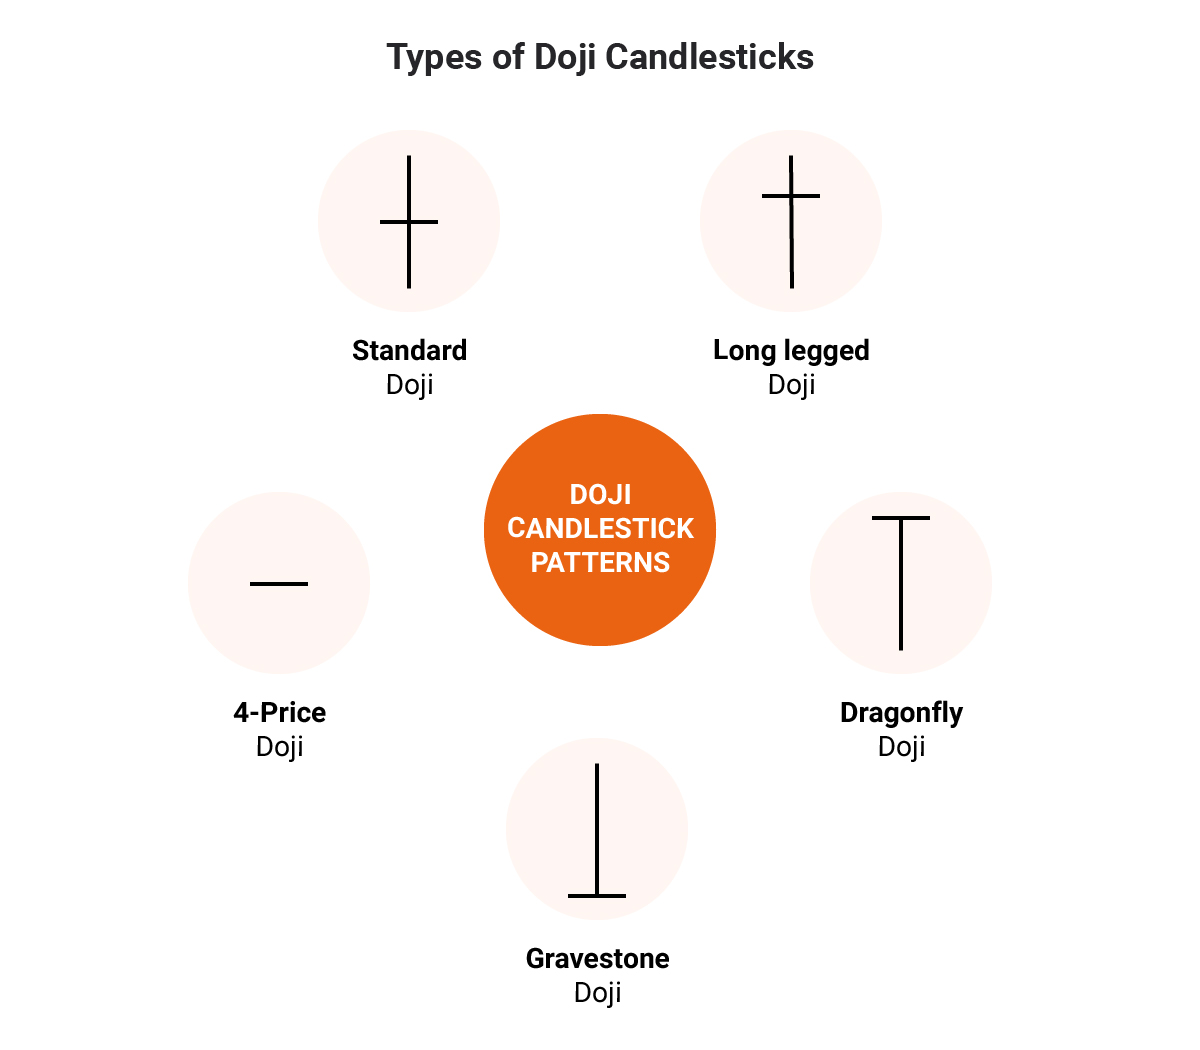 Top 5 Types of Doji Candlesticks